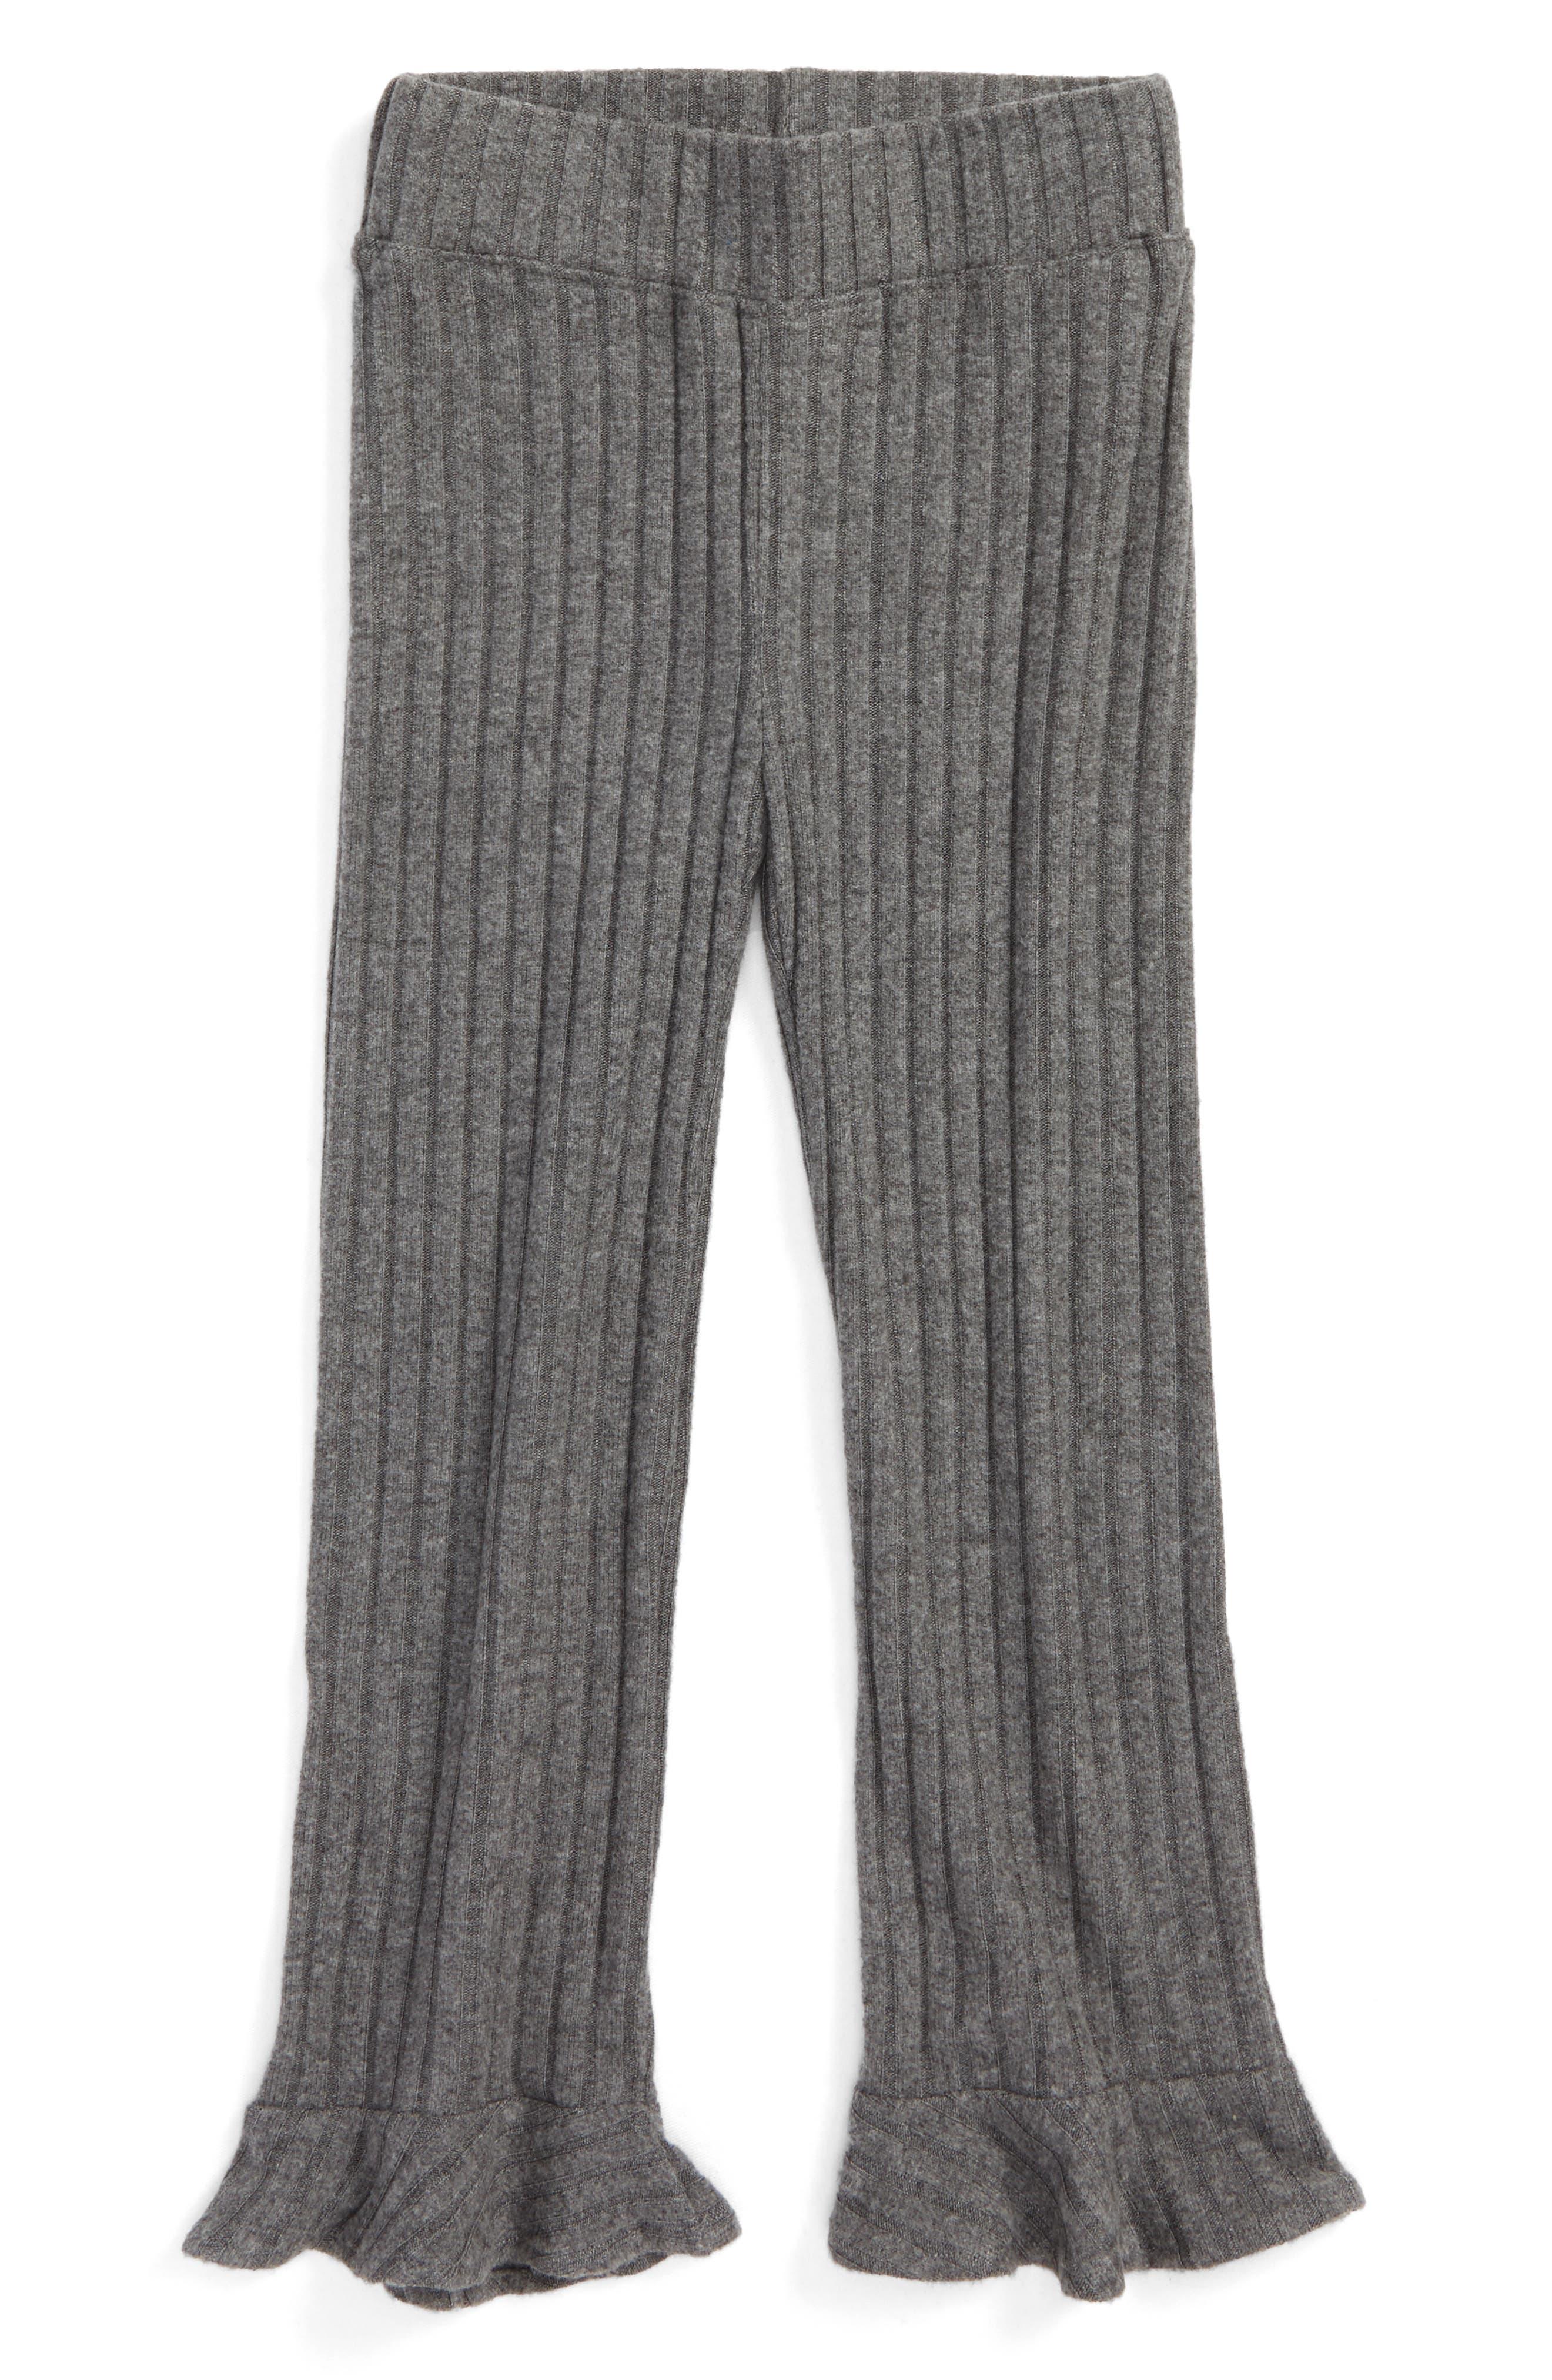 Penny Organic Cotton Flared Ruffle Pants,                             Main thumbnail 1, color,                             020